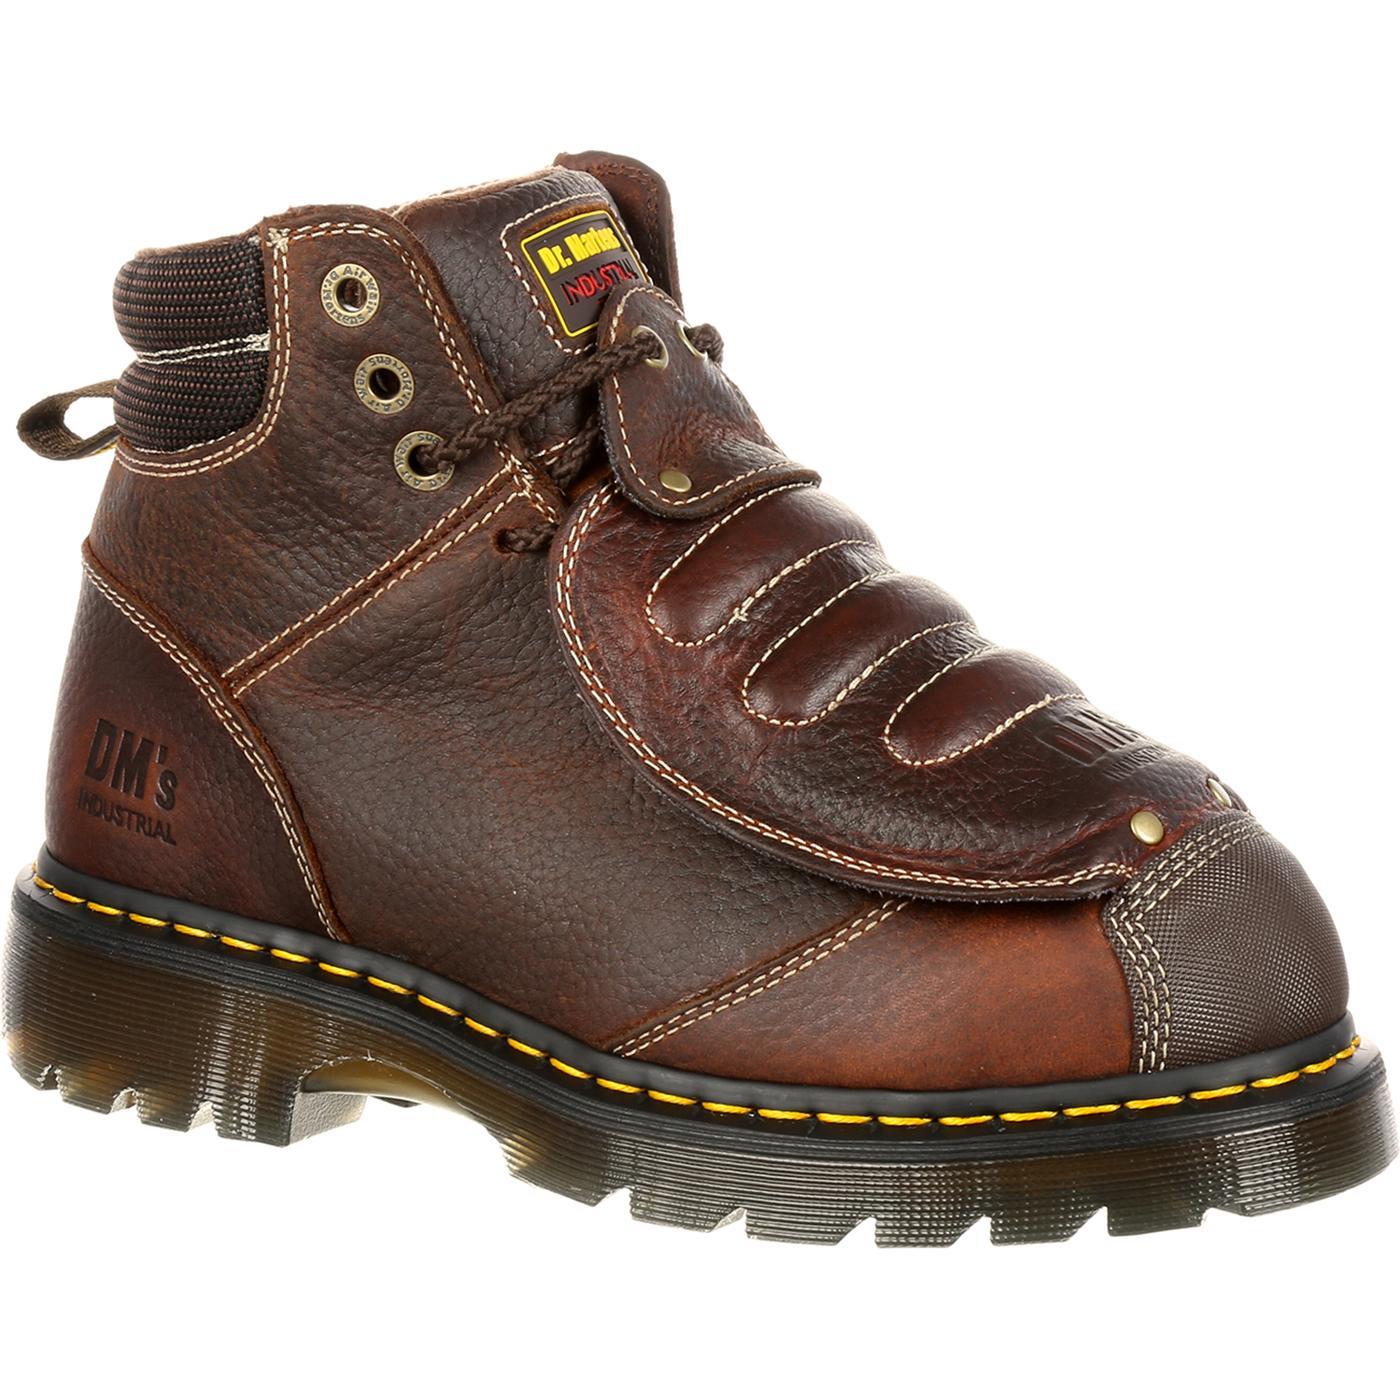 dr martens heritage steel toe metatarsal eh work boot